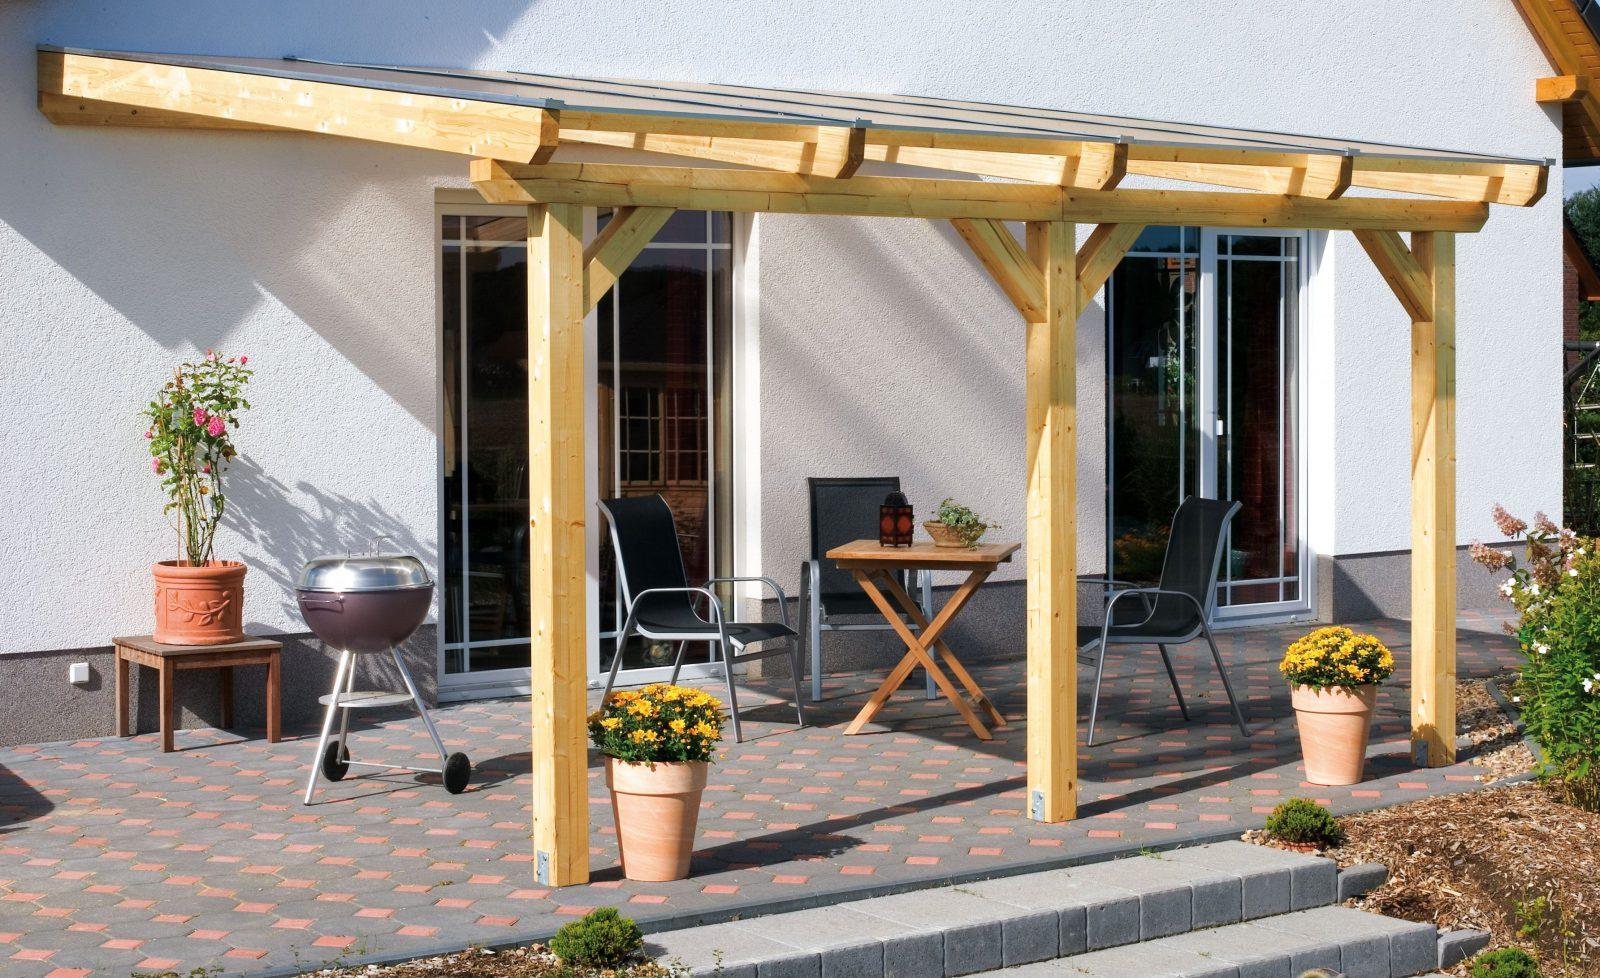 Terrassenüberdachung Bauanleitung Frisch Terrassenüberdachung Holz von Überdachung Holz Selber Bauen Bild